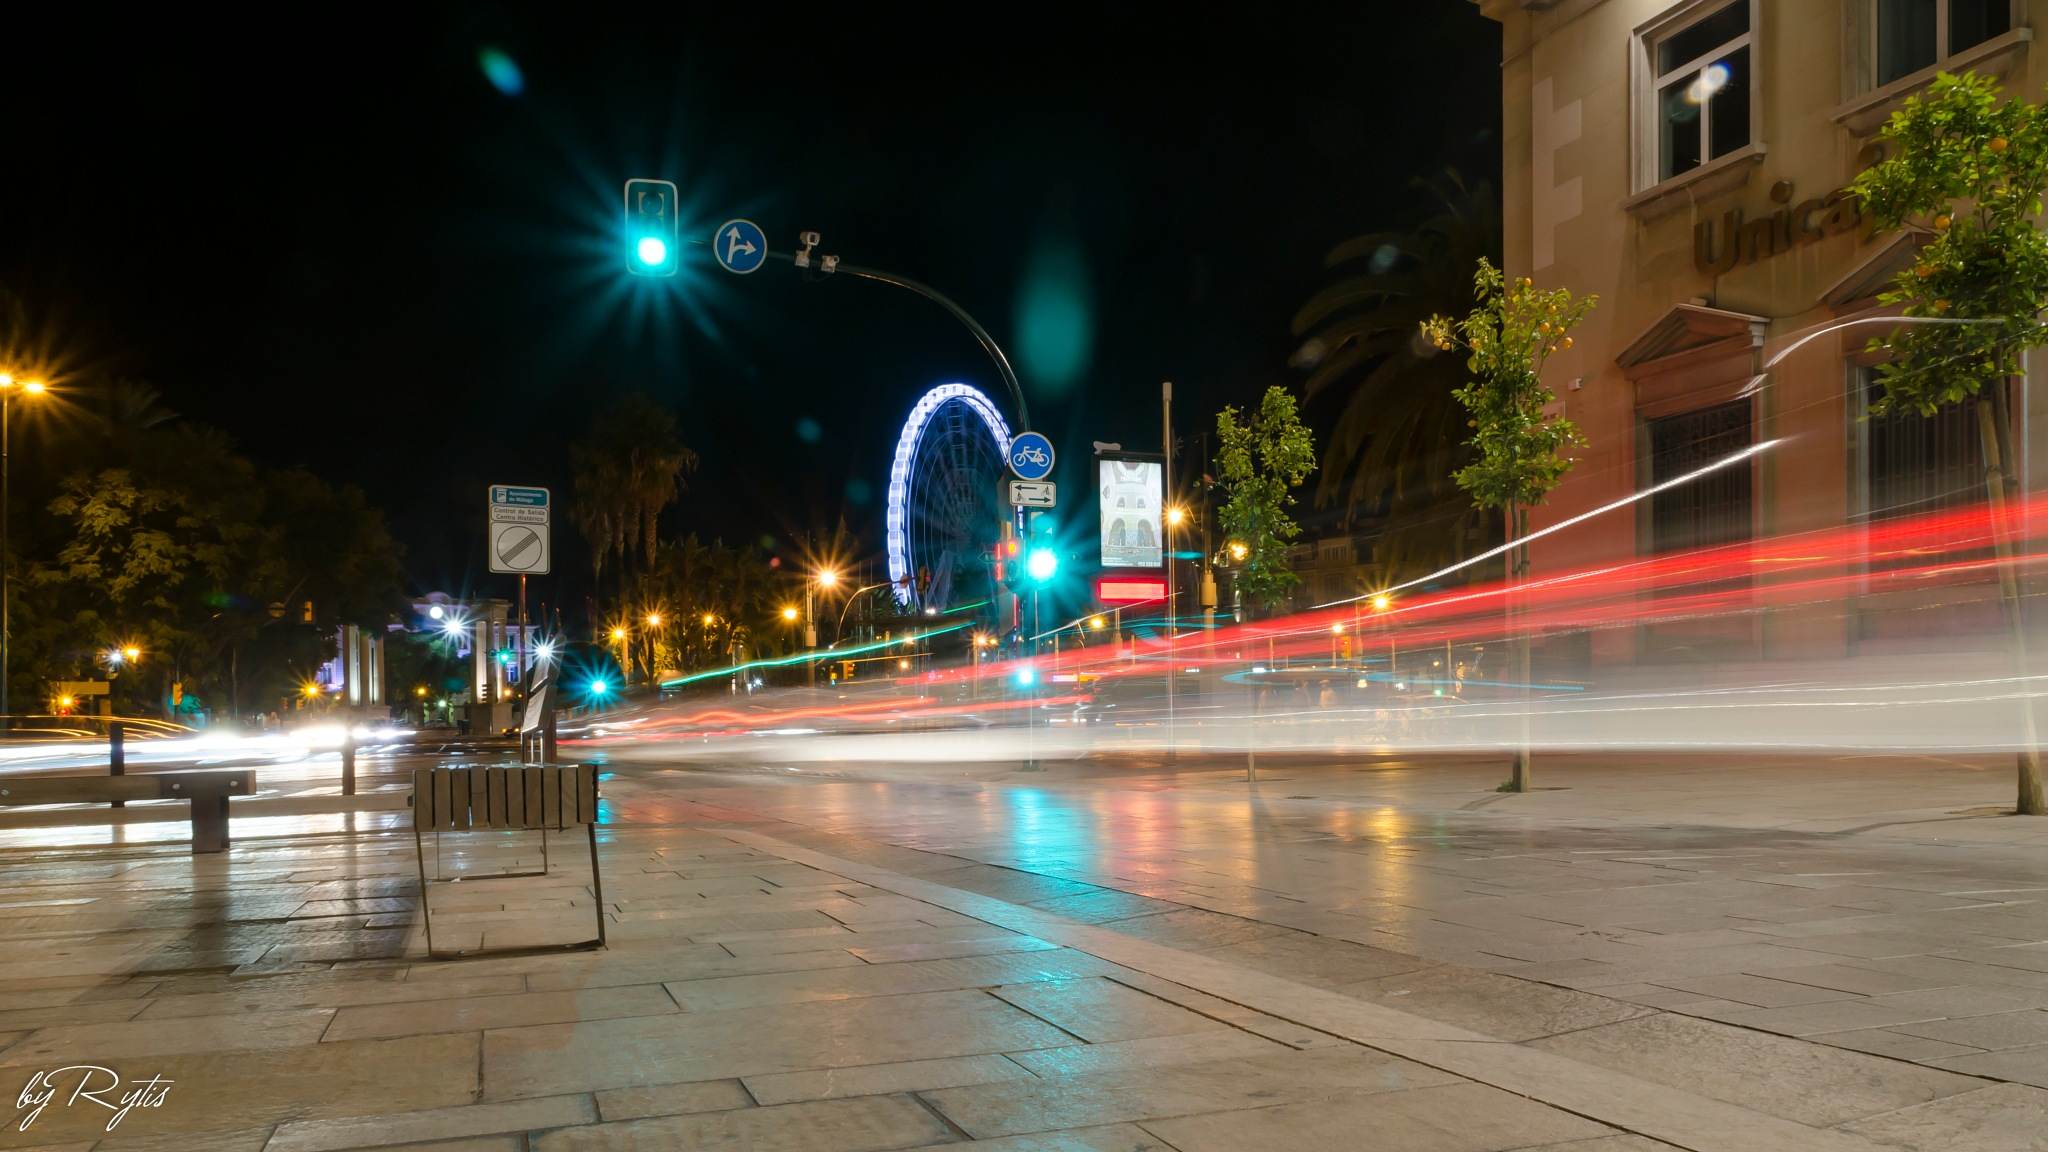 Malaga by rytiss50